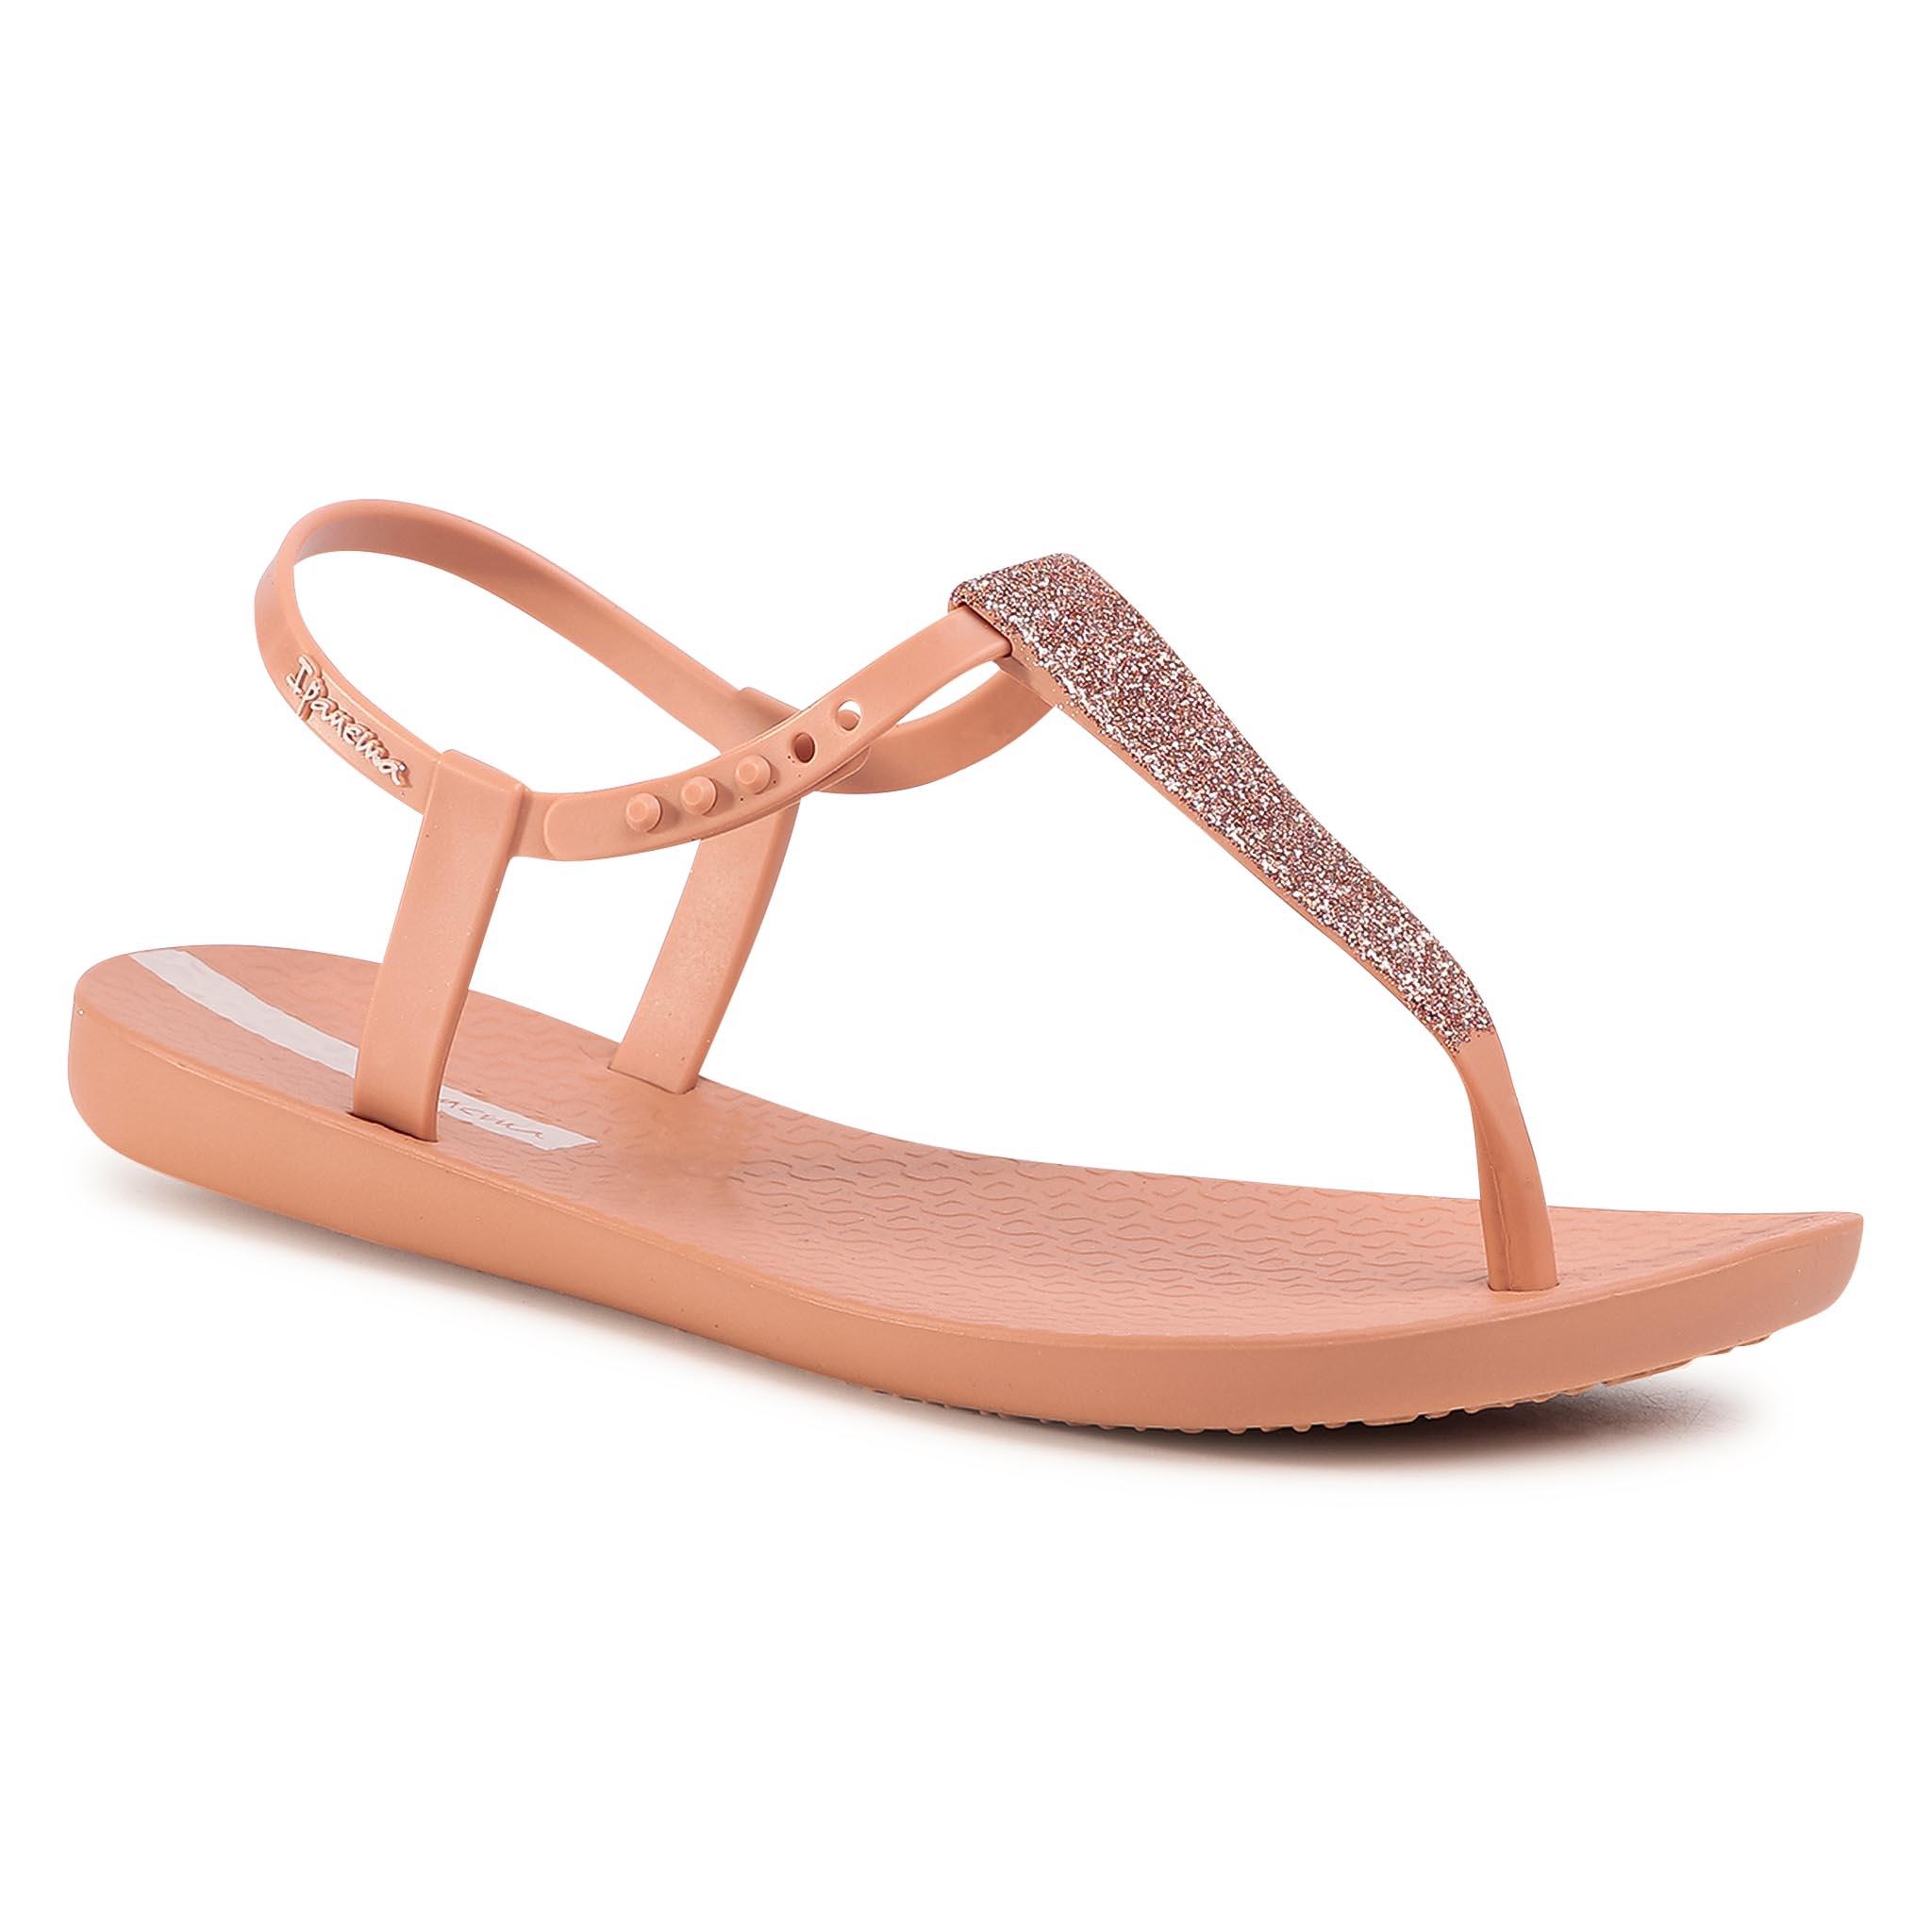 Image of Sandali IPANEMA - Class Pop Sandal 82683 Brown/Glitter Brown 24987